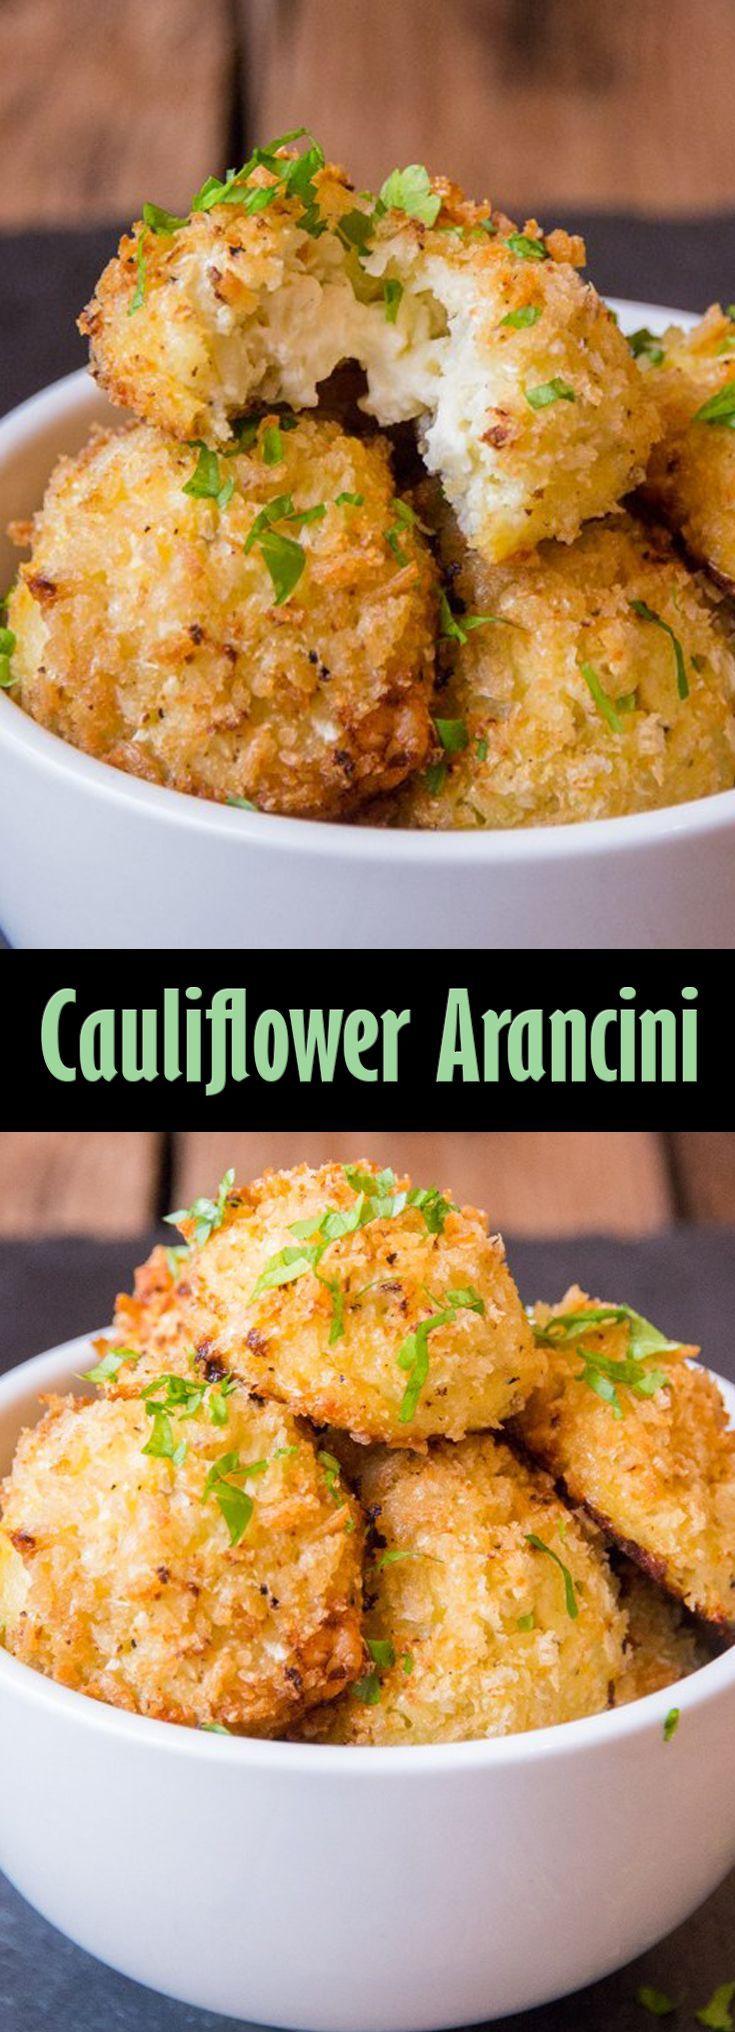 Cauliflower Arancini